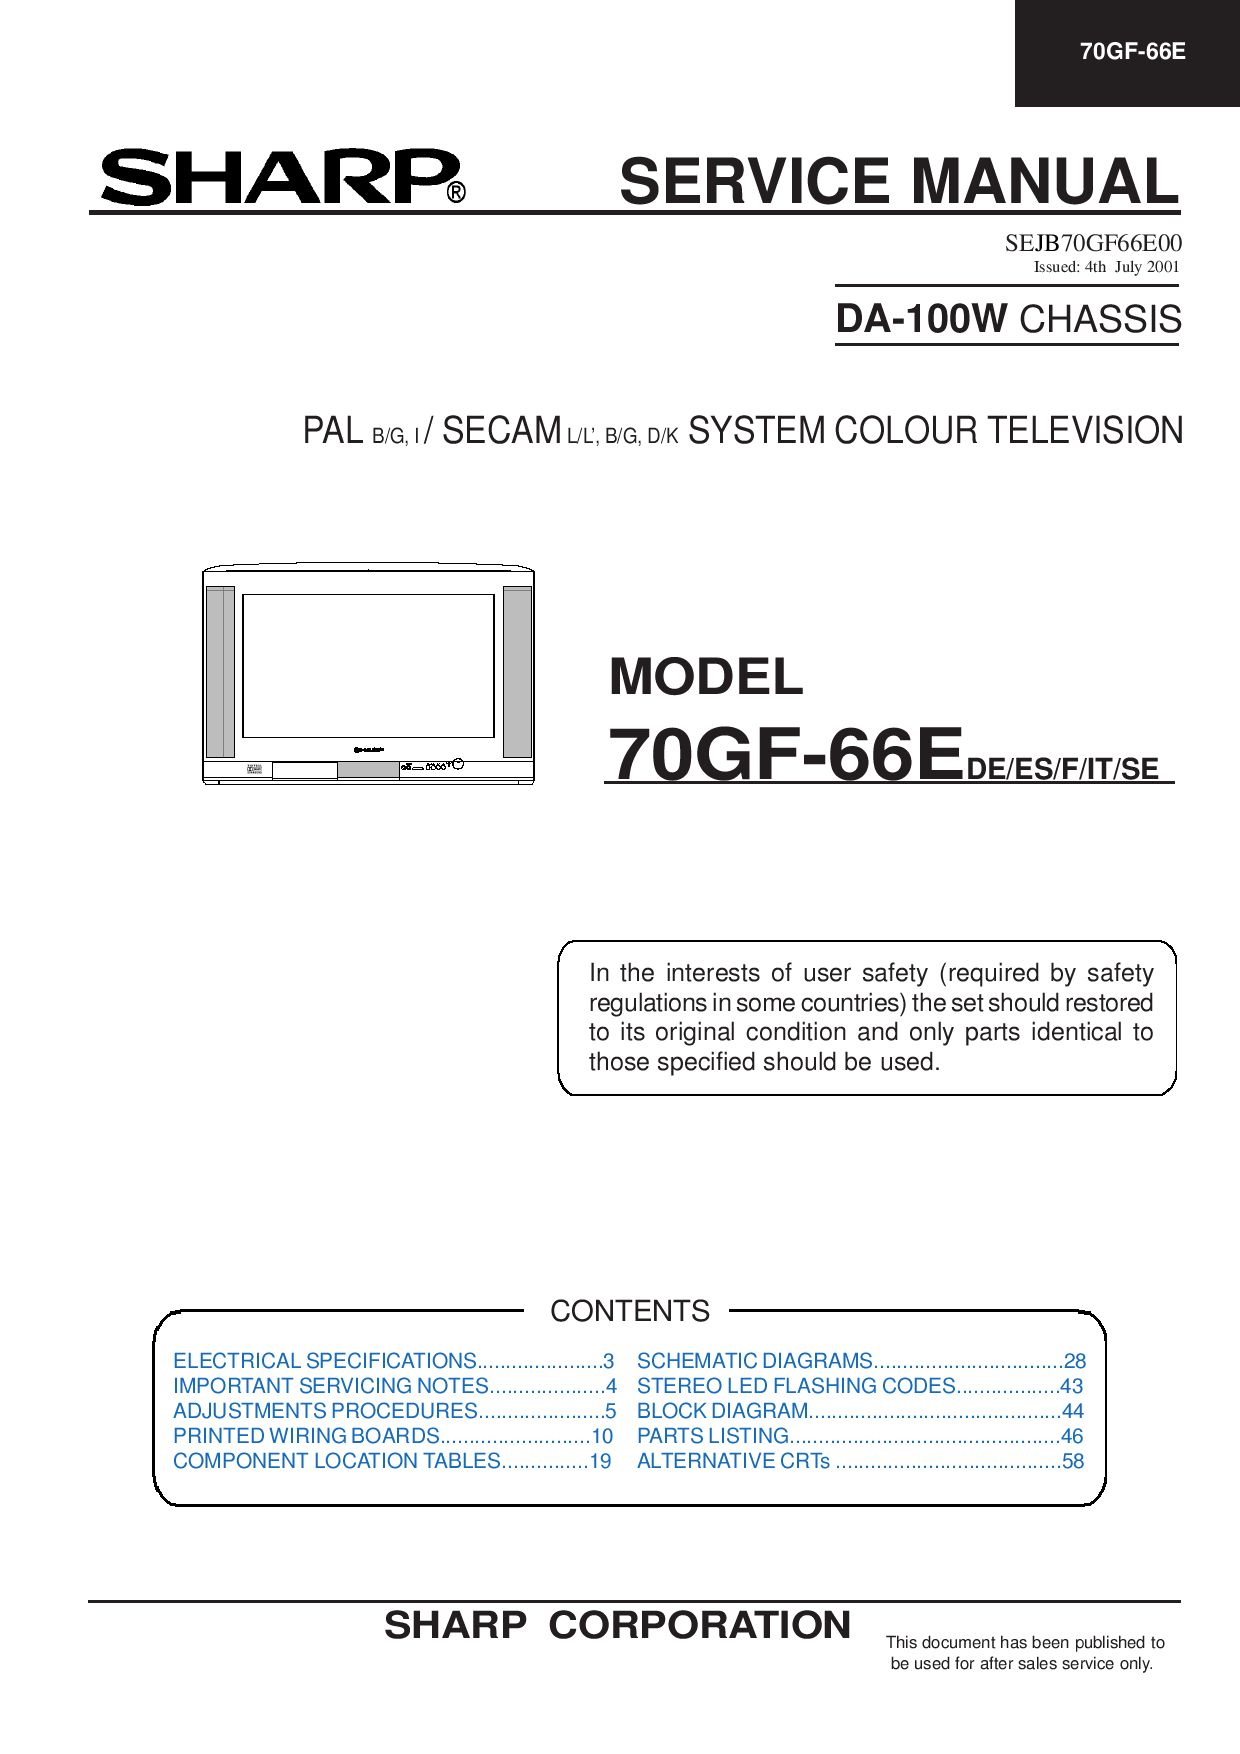 daewoo 70gf 66e television cricuit diagram